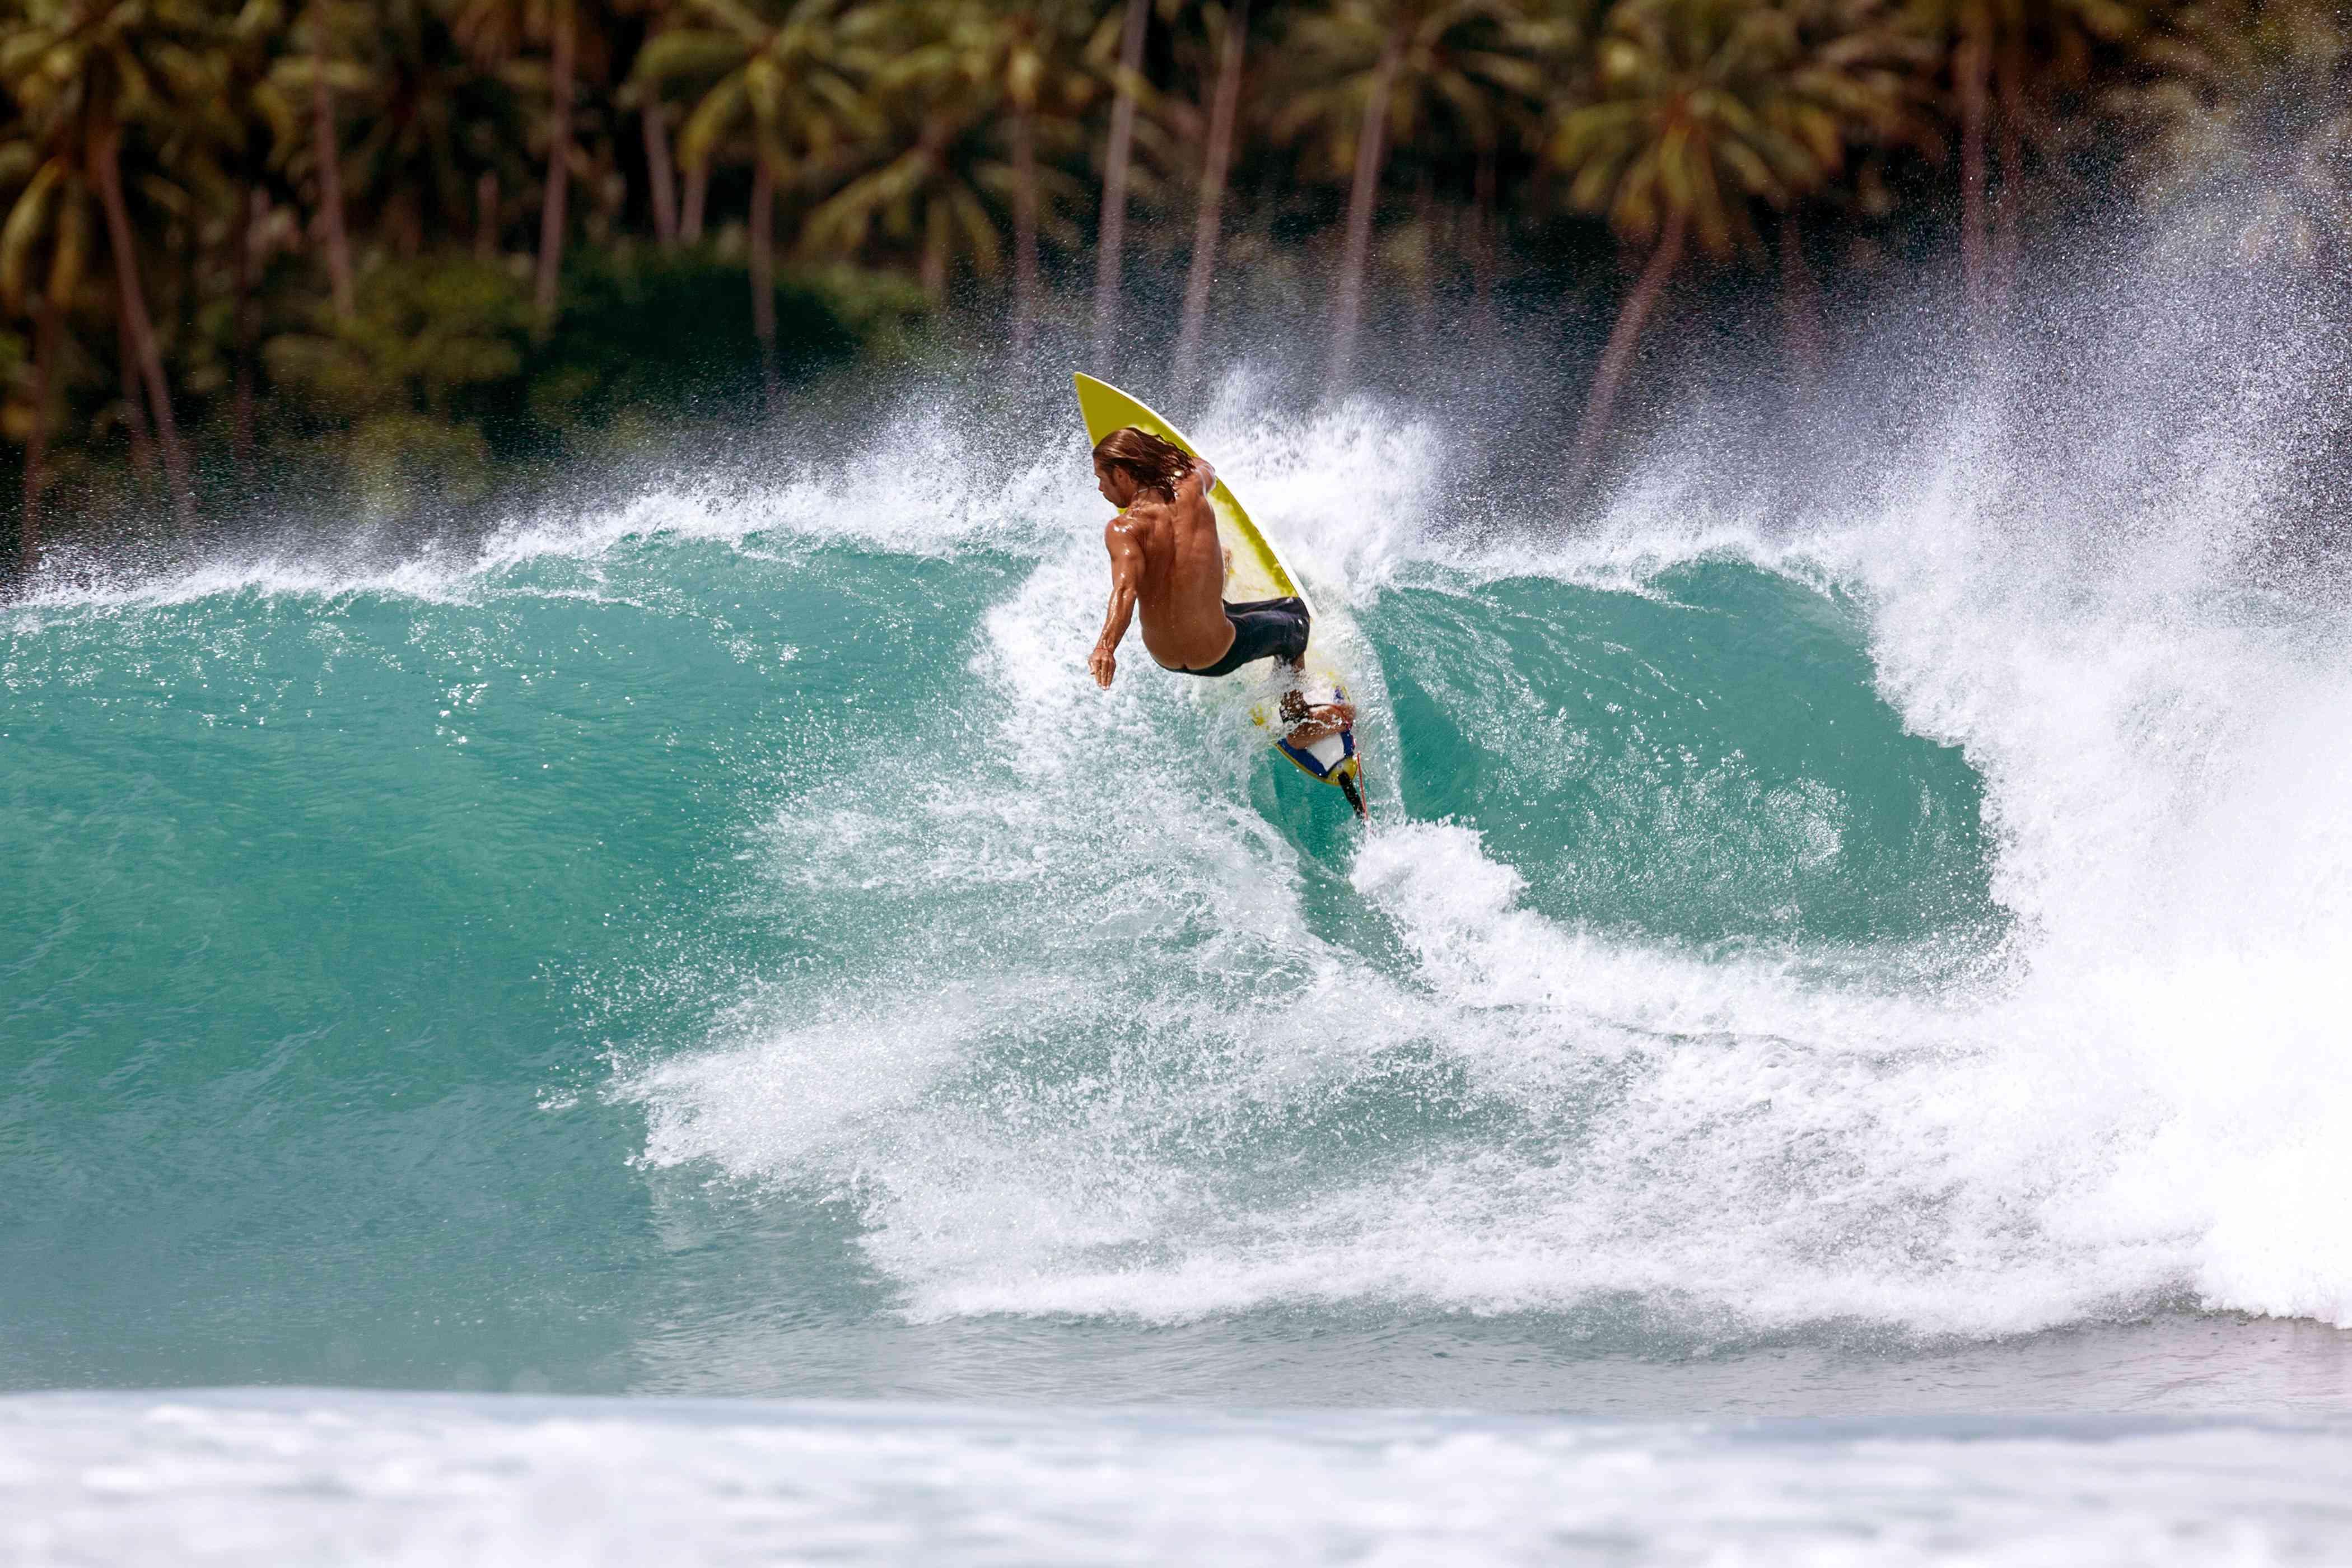 A surfer at Nias Island in Sumatra